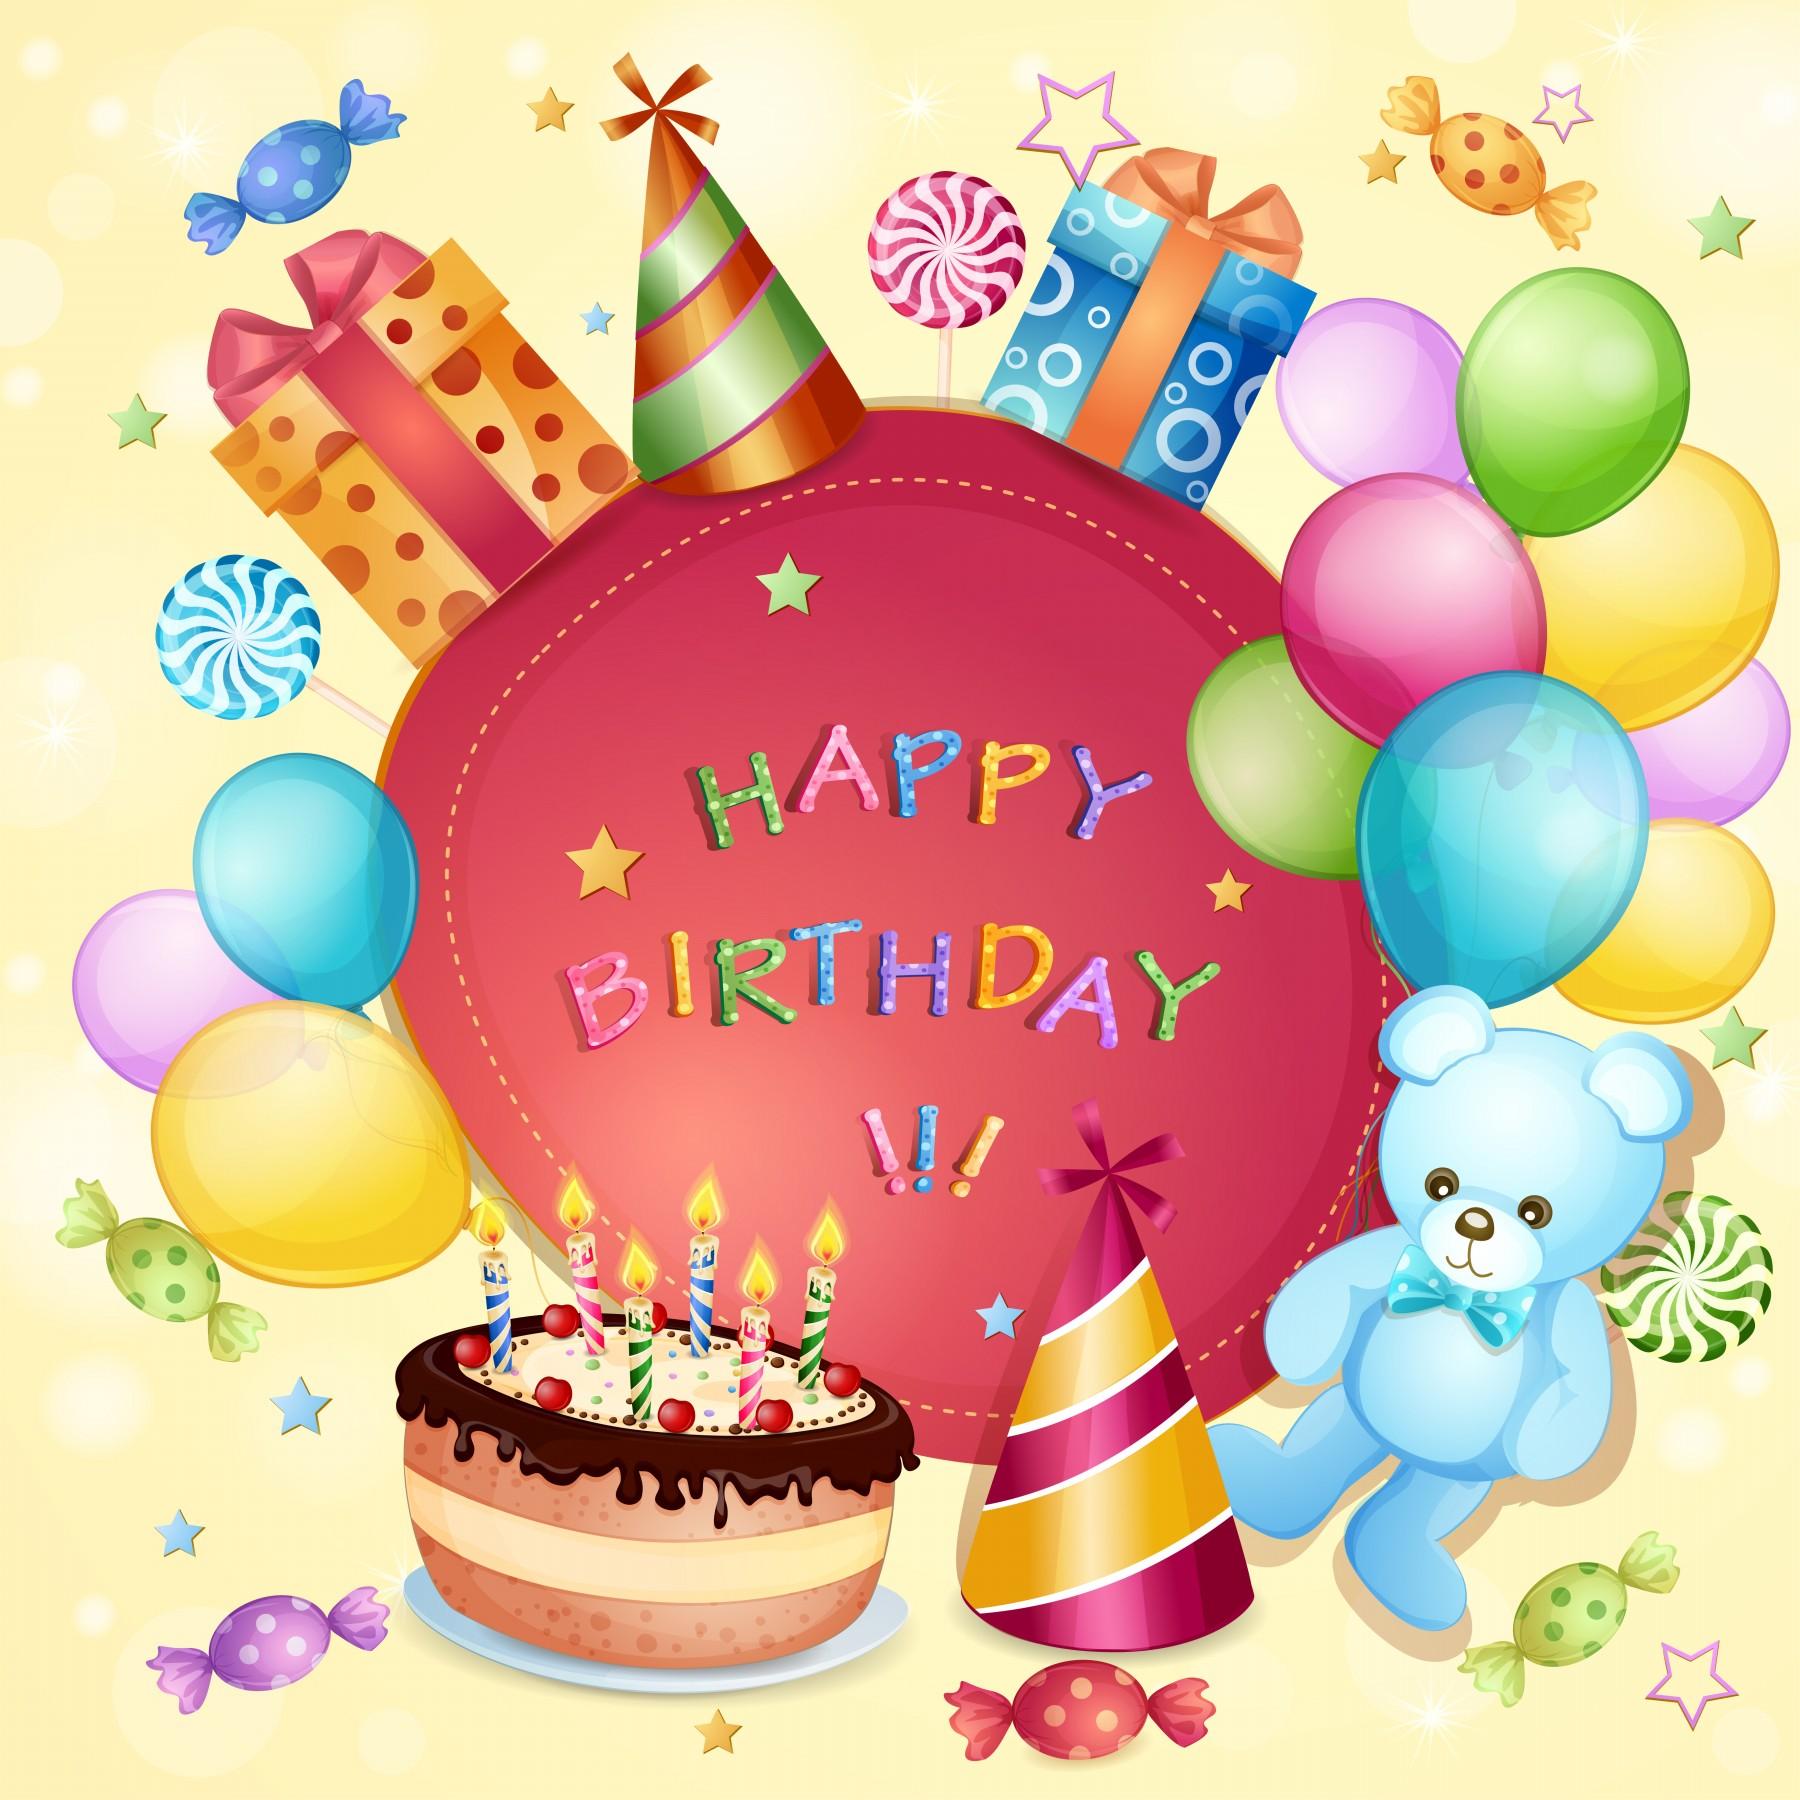 happy birthday images past - happy birthday images past - Wallpapers, hd-wallpapers, HD, Free, Birthday, 4k-wallpapers, 4k